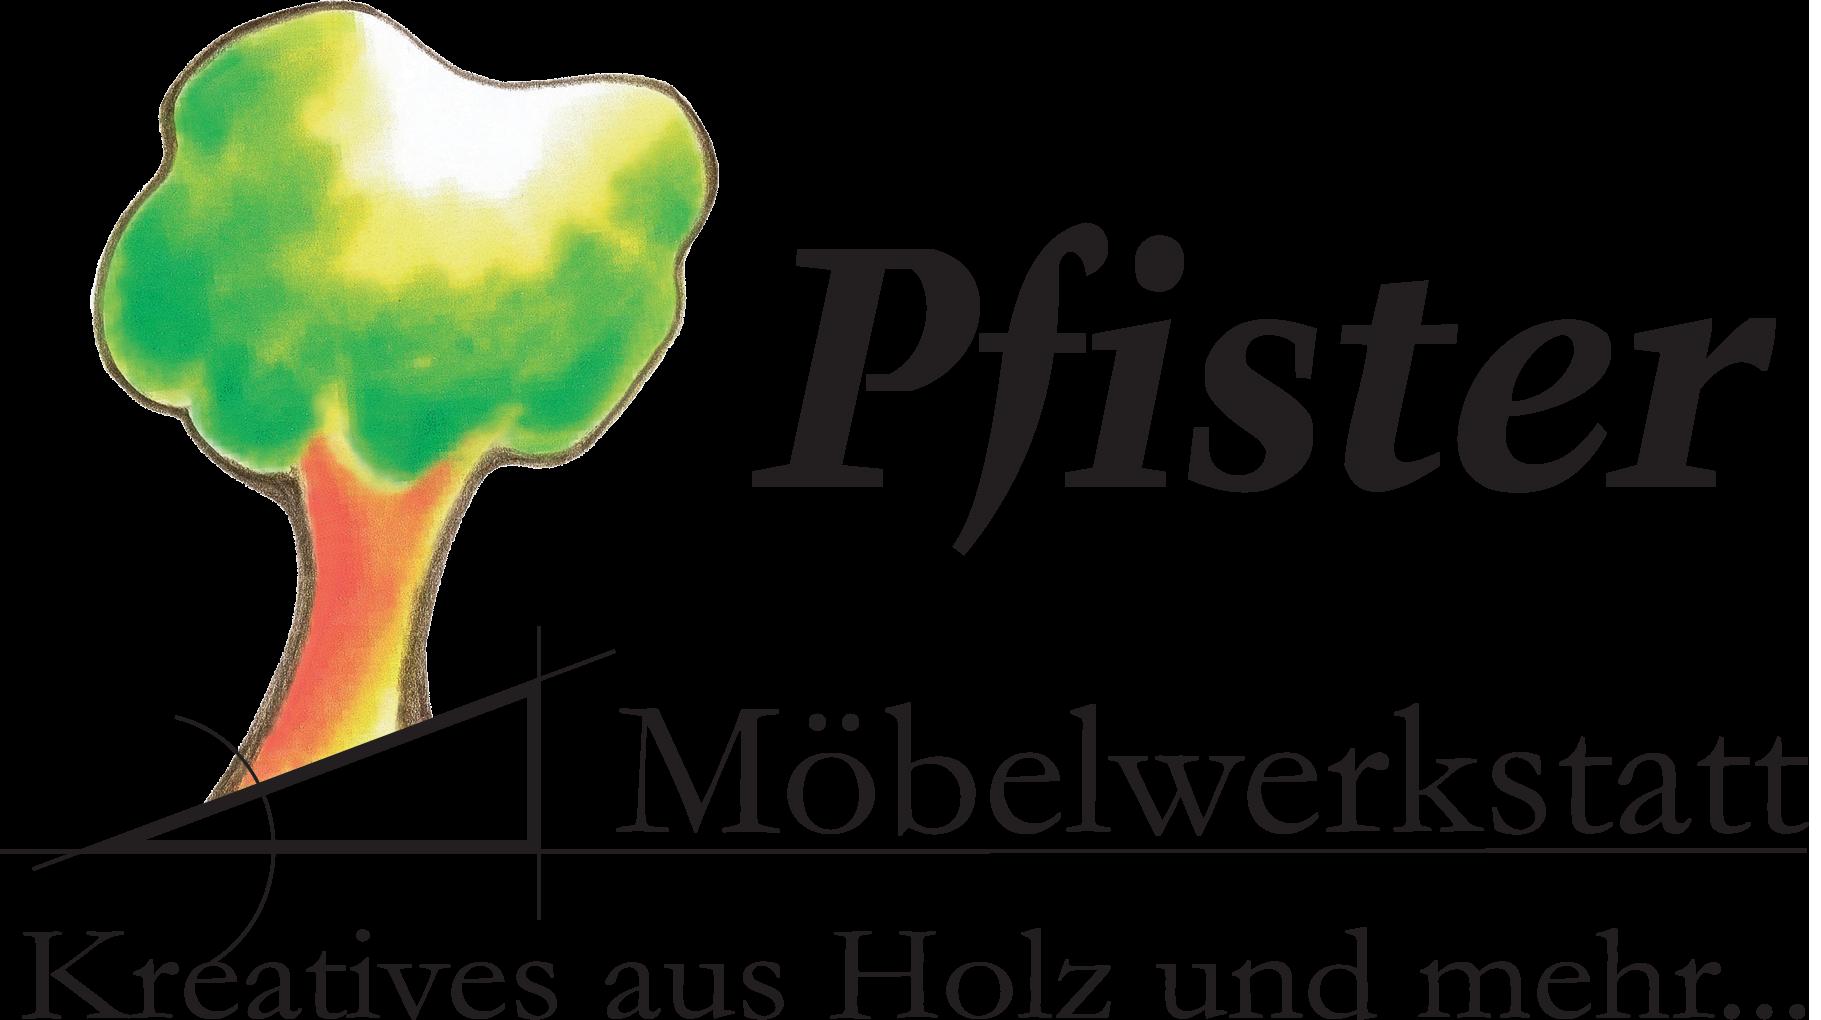 Logo-Pfister-0221-1